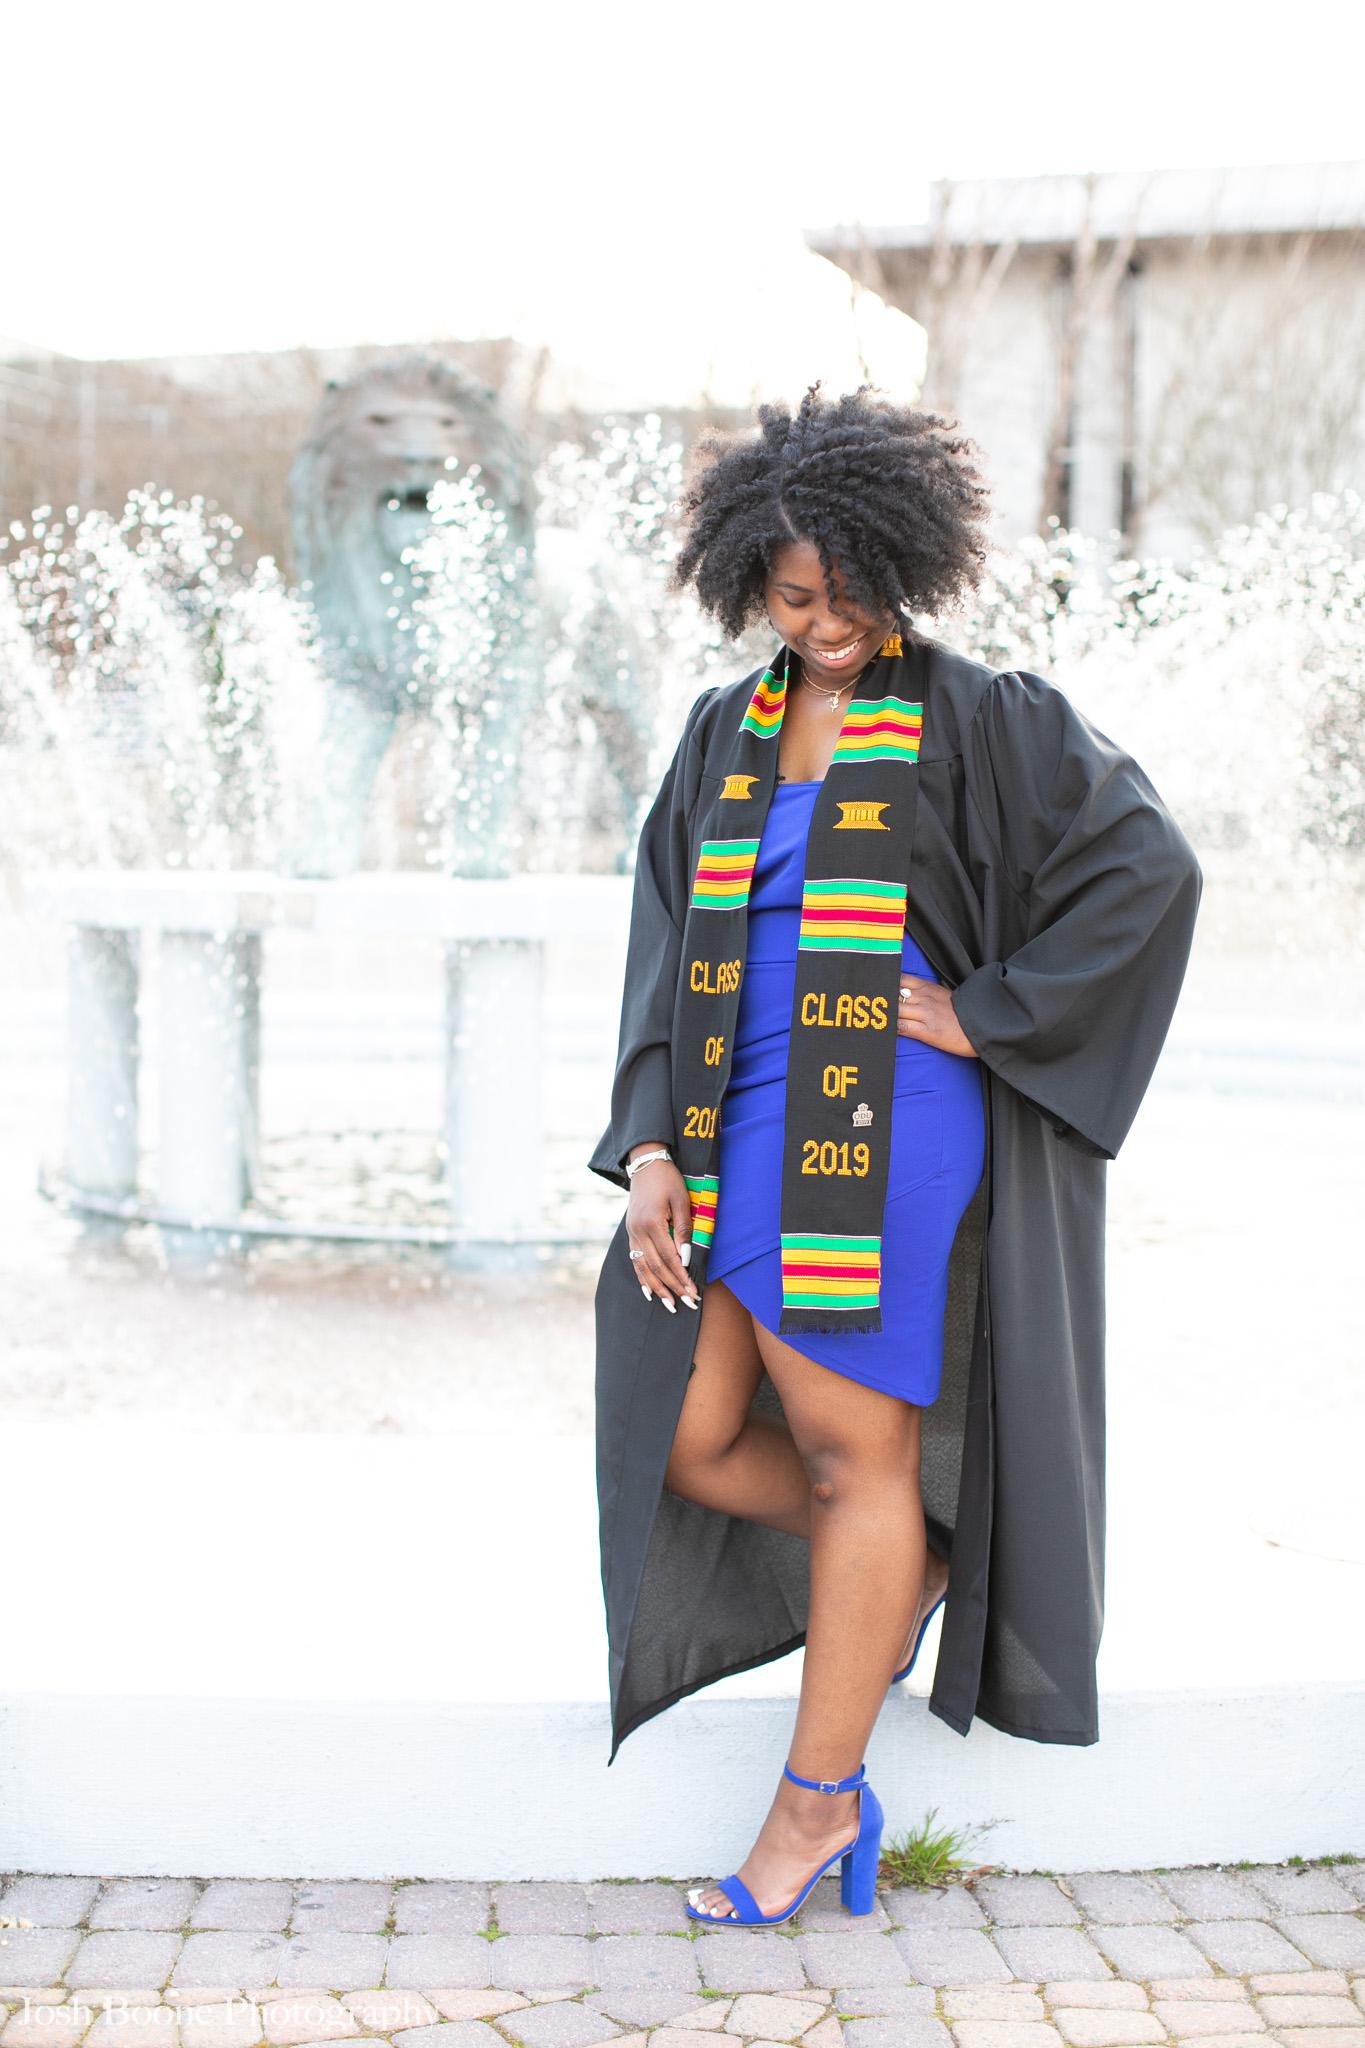 old_dominion_university_graduation_pictures-8.jpg